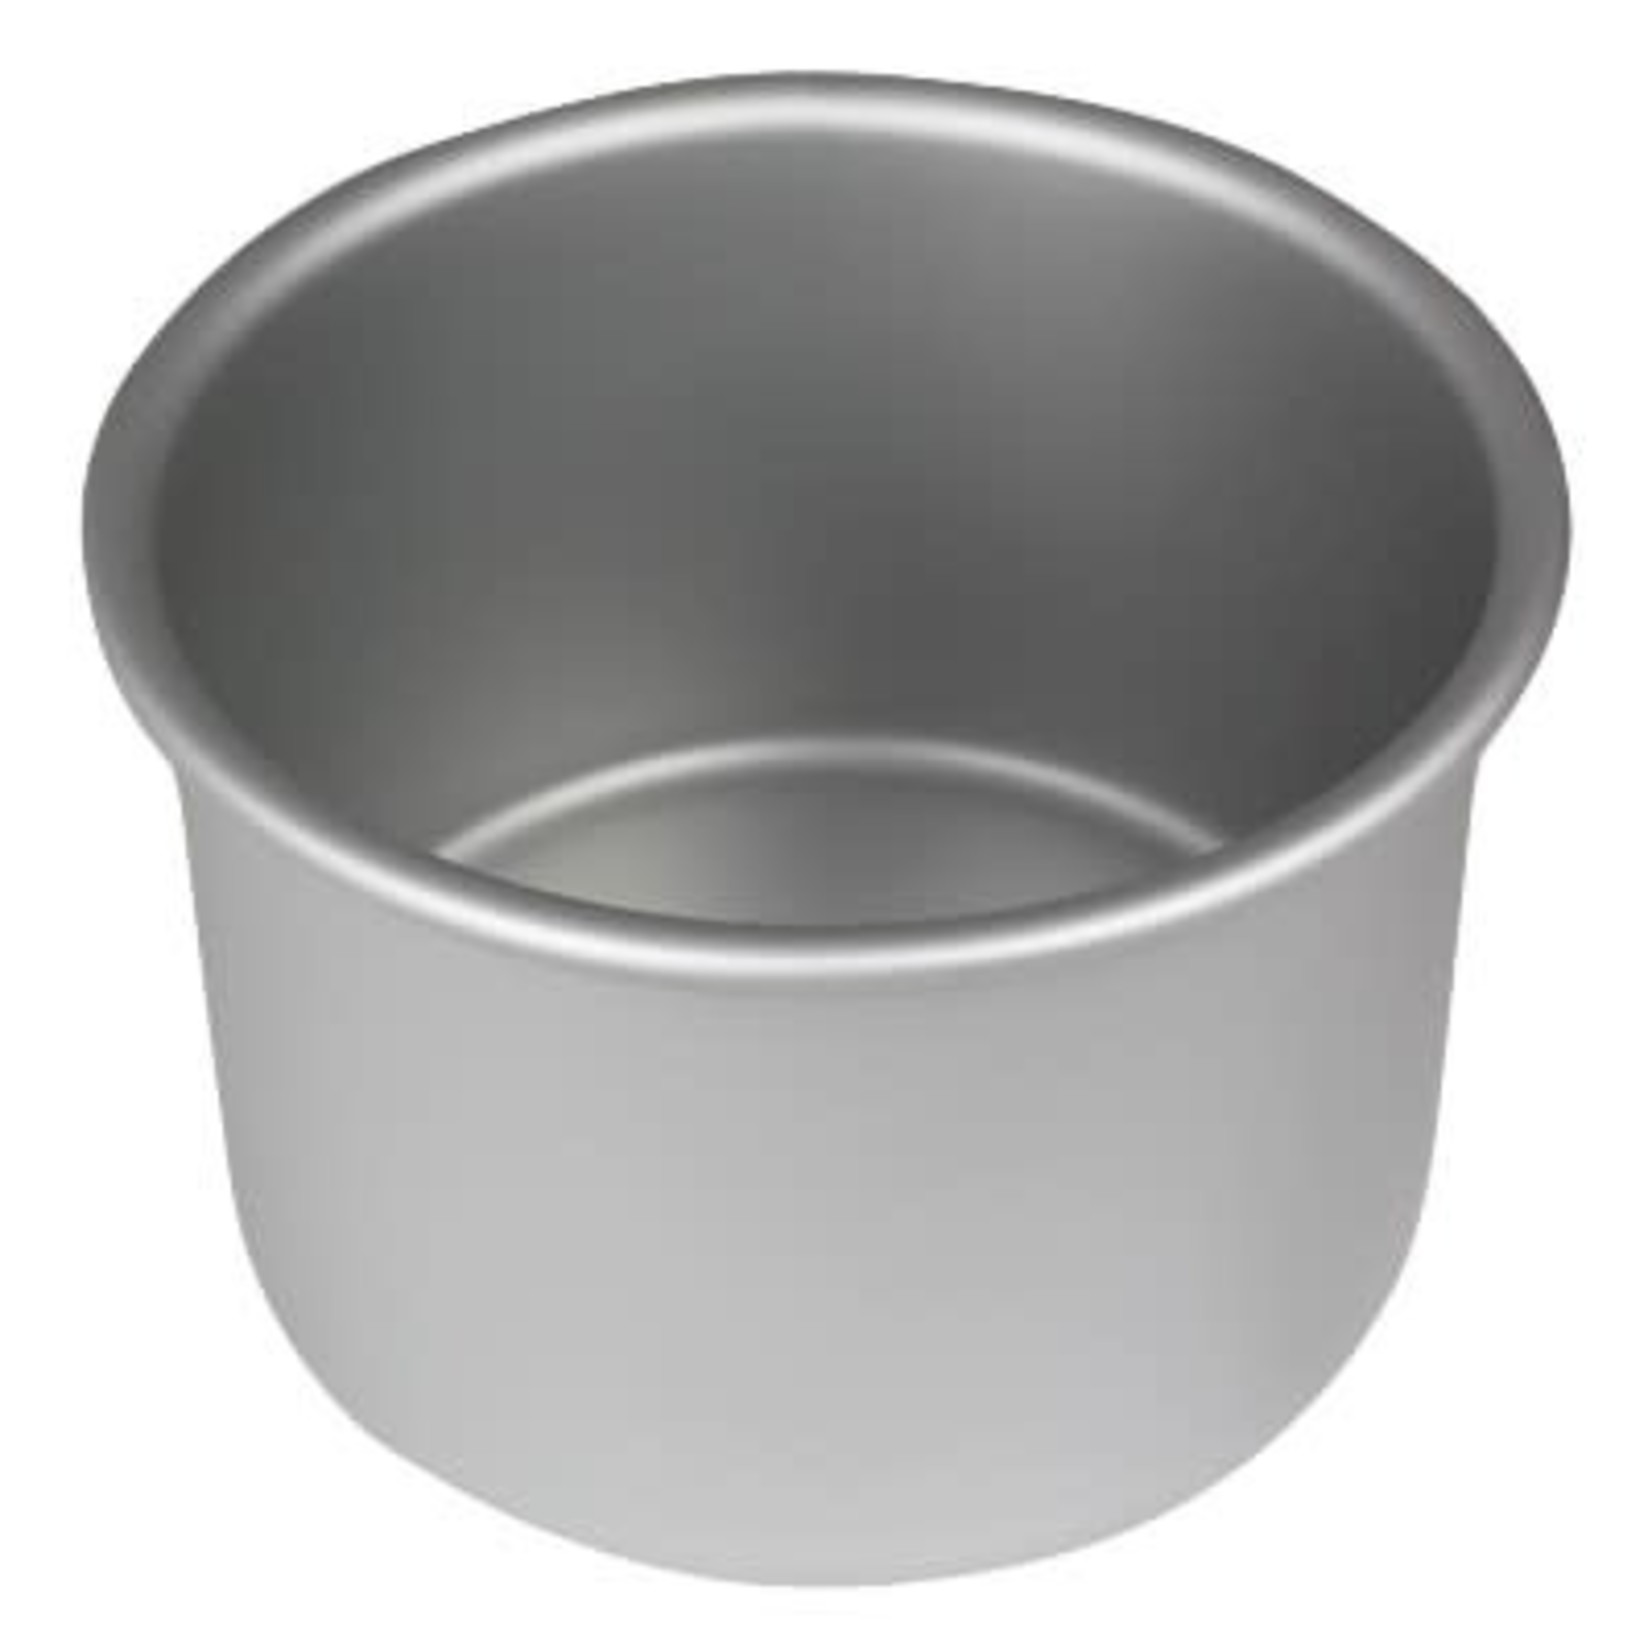 Decora aluminium bakvorm rond 10x7,5cm